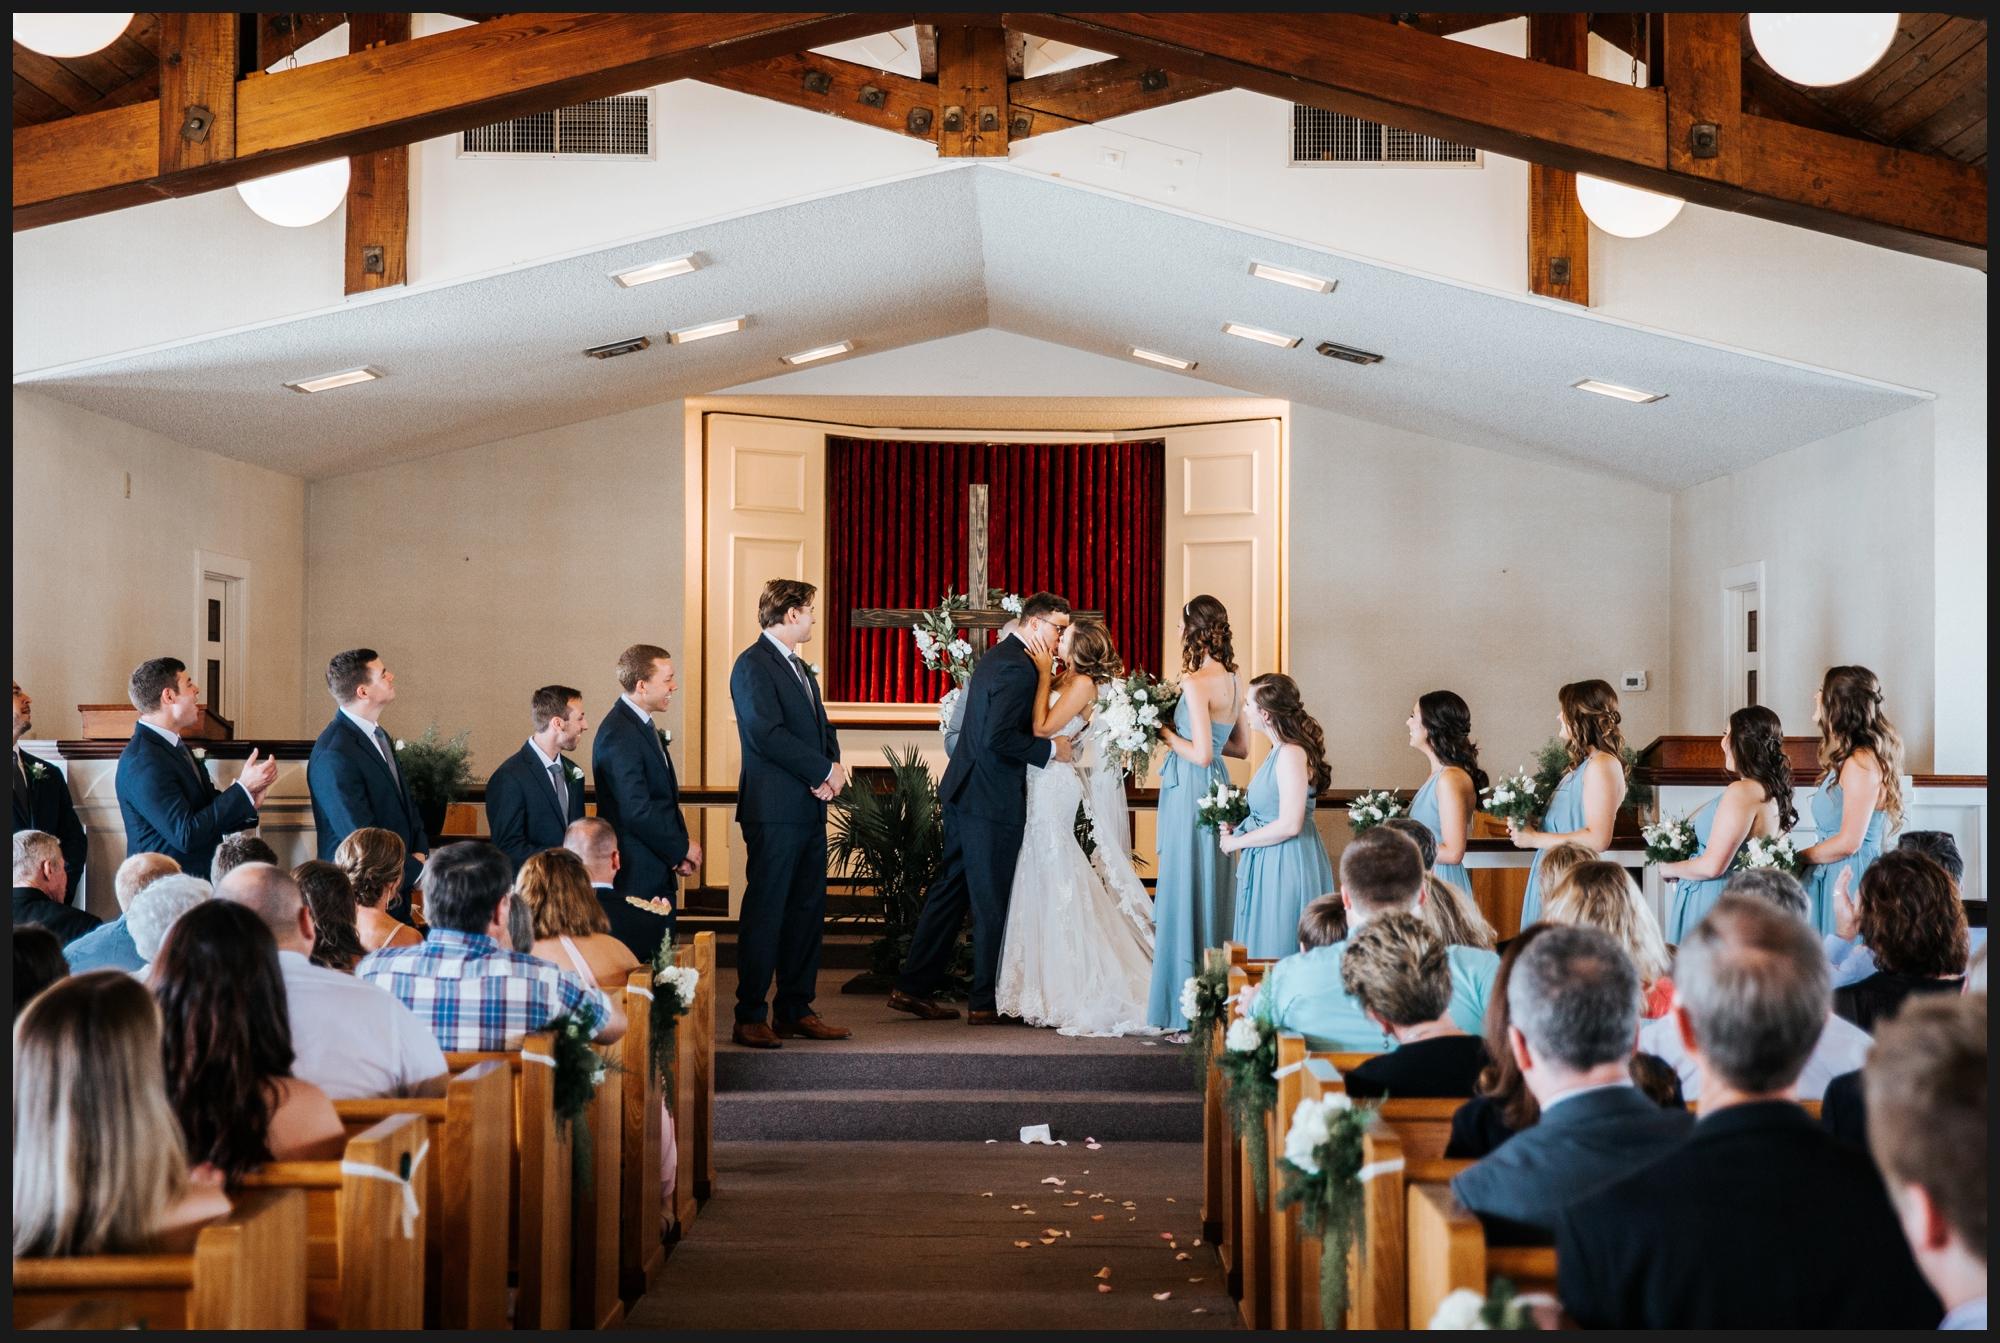 Orlando-Wedding-Photographer-destination-wedding-photographer-florida-wedding-photographer-bohemian-wedding-photographer_0072.jpg